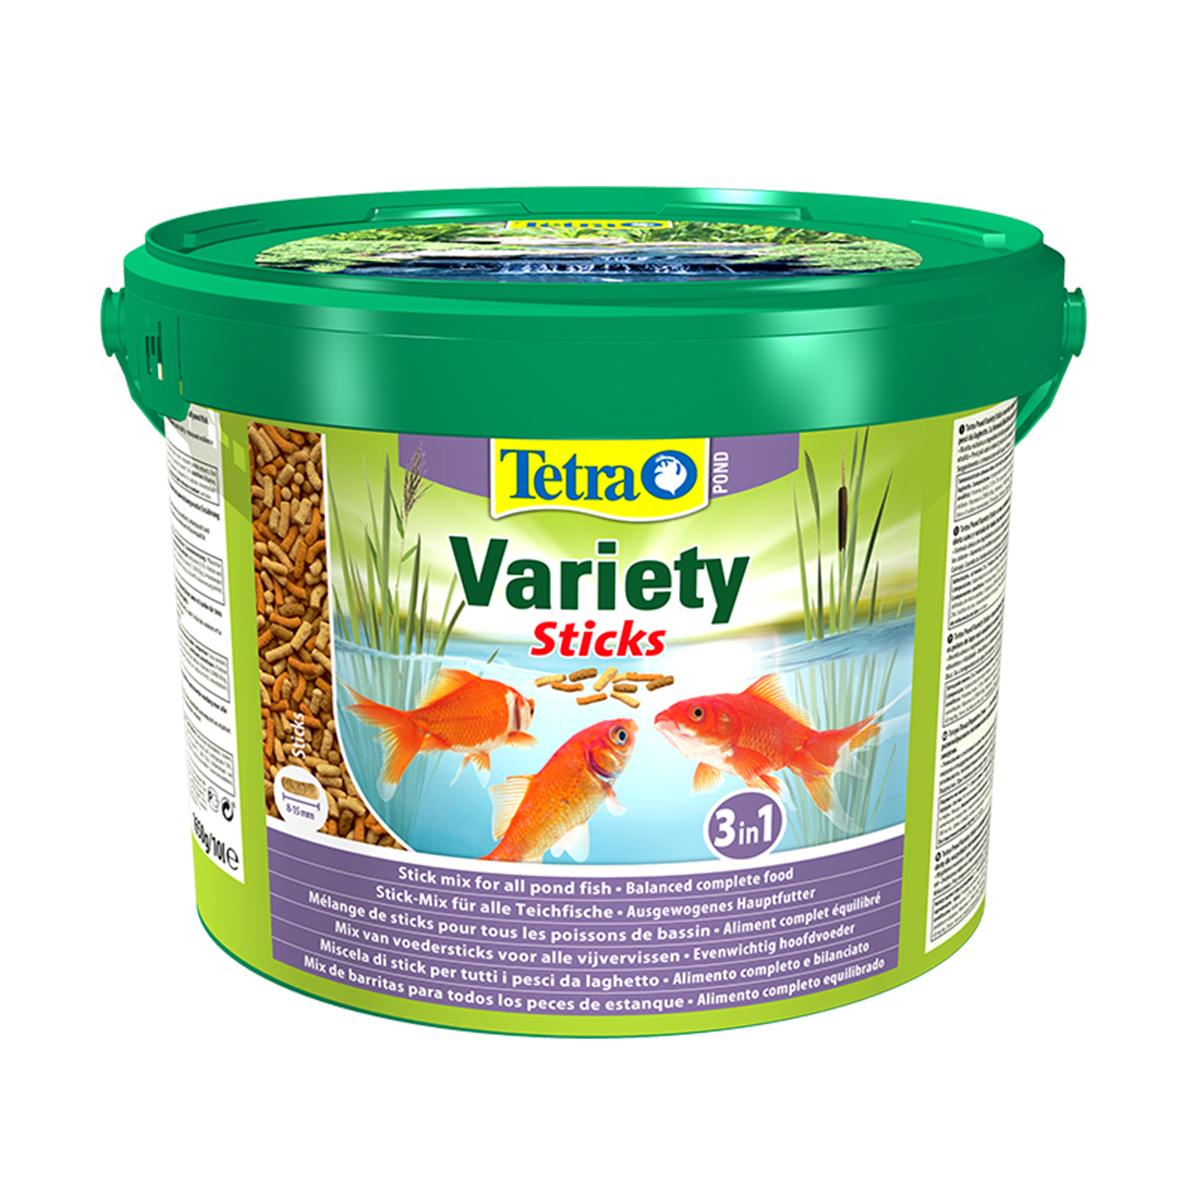 10 litre tetra pond variety sticks bucket floating koi food diet 1650g tetrapond ebay. Black Bedroom Furniture Sets. Home Design Ideas